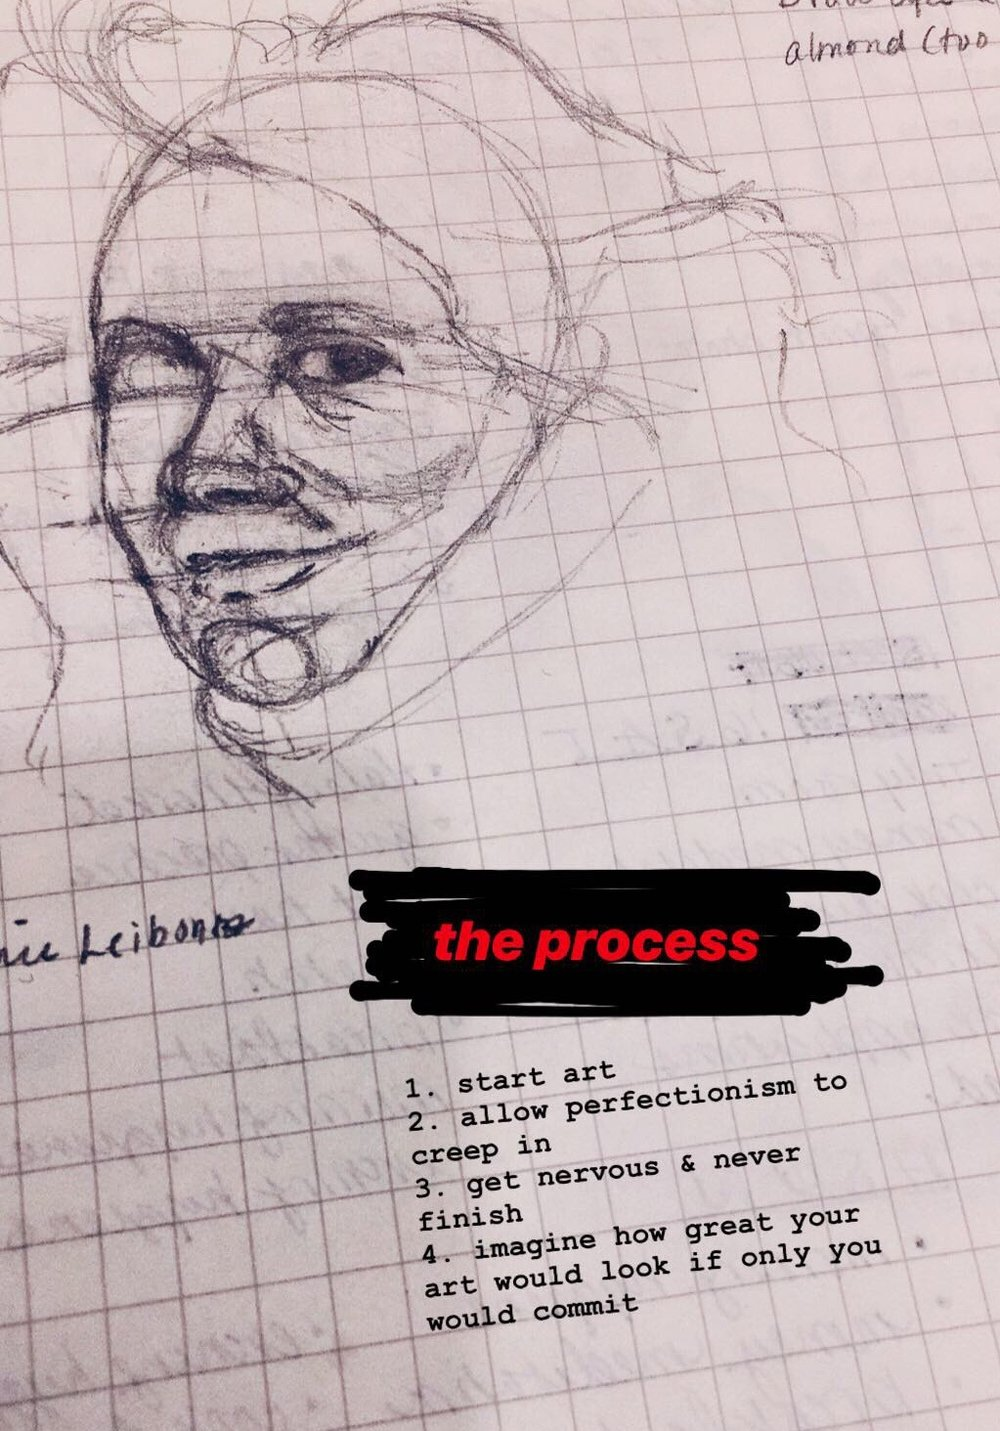 Beginner artists: gripe about perfectionism via unfinished art on Instagram.  (@t.spellen)